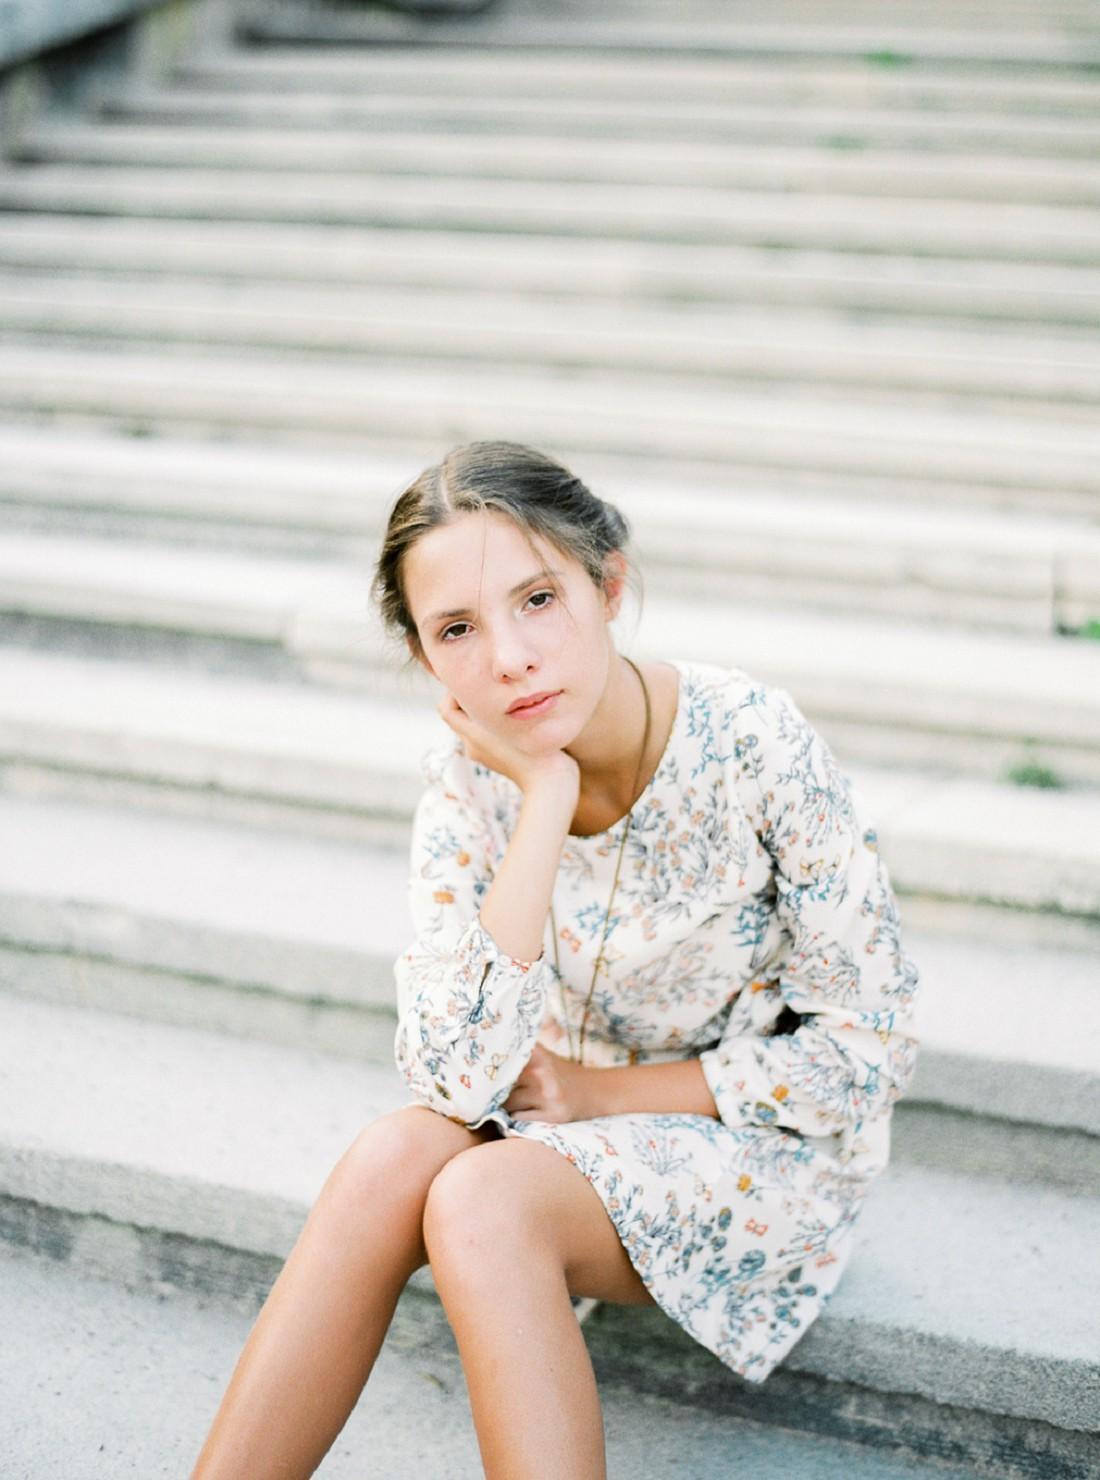 Portraitfotos, Dorelies Hofer, Wien, Österreich, Filmfotografie